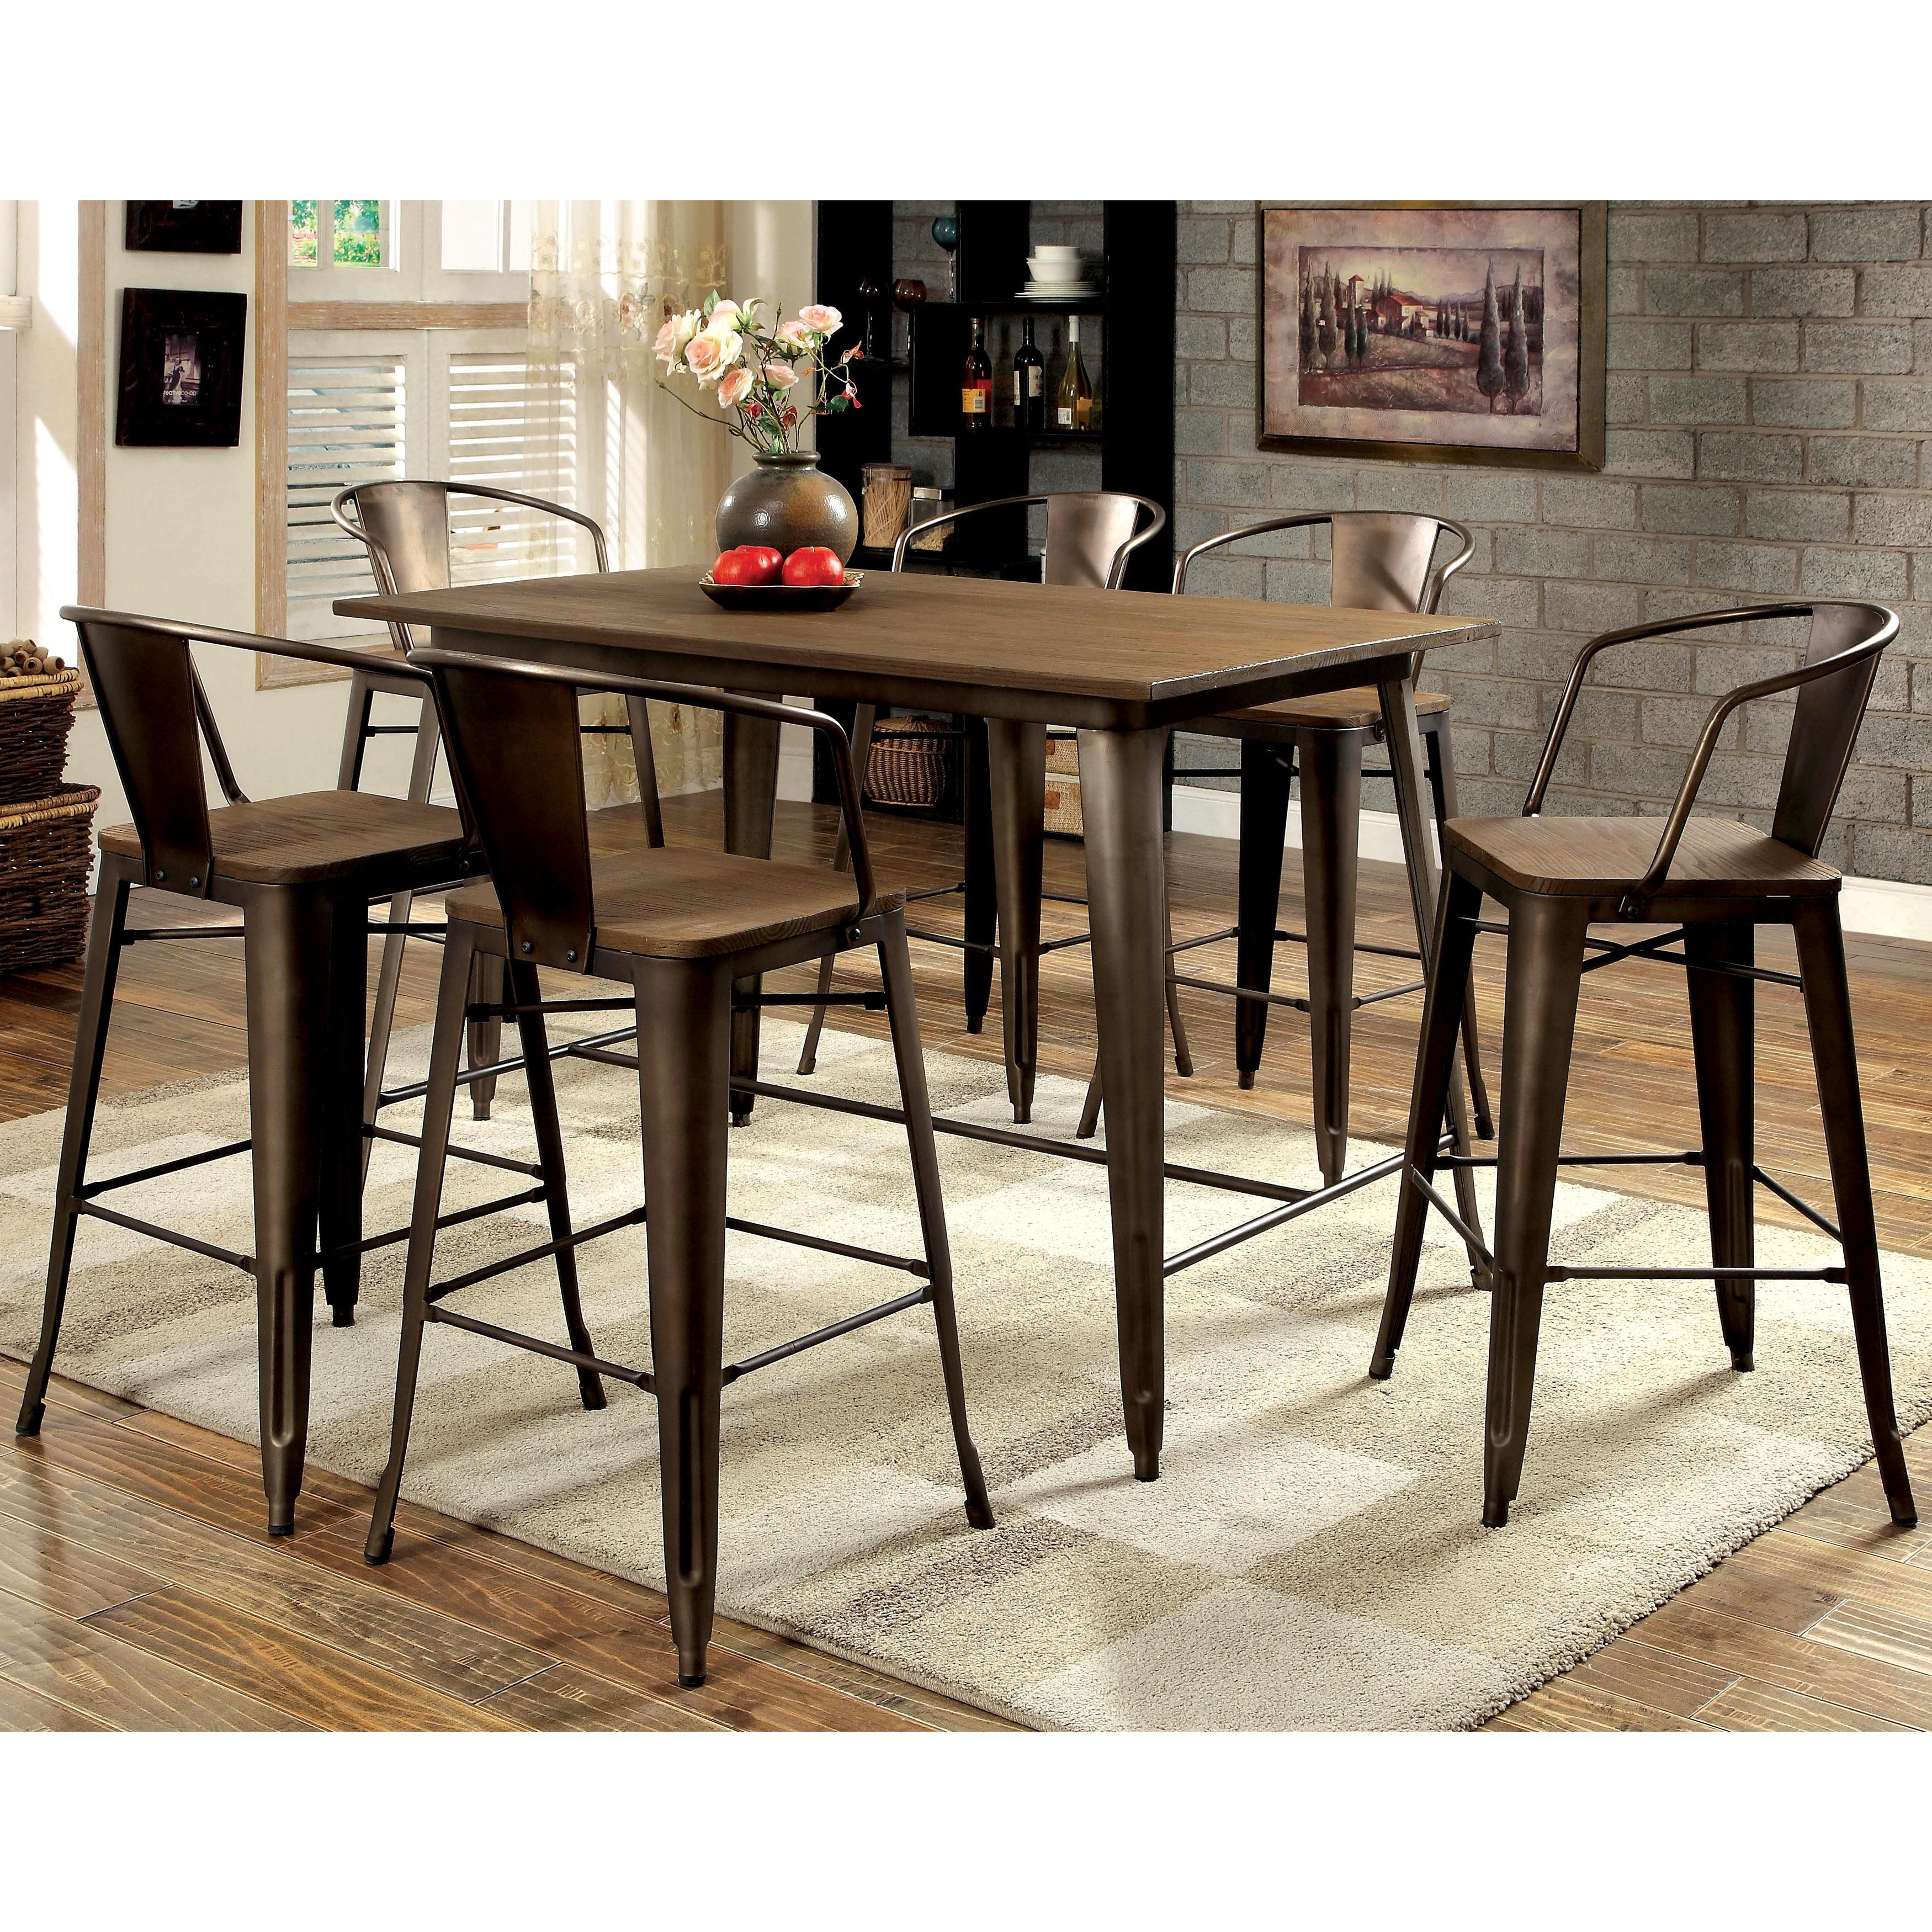 Furniture of America Tripton Industrial 7-Piece Counter H...